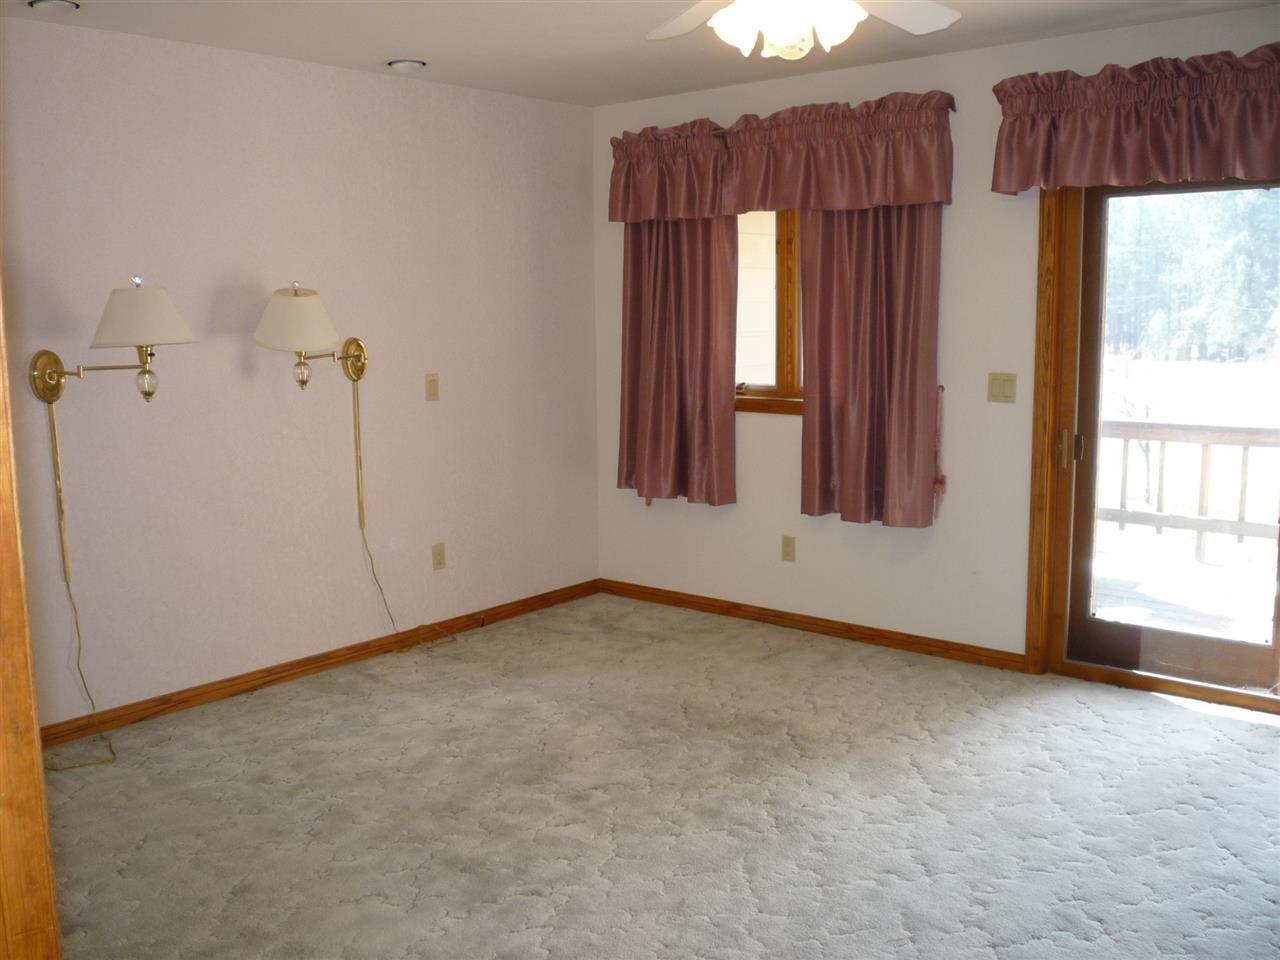 Additional photo for property listing at 955 Manzanita Street 955 Manzanita Street Portola, California 96122 United States